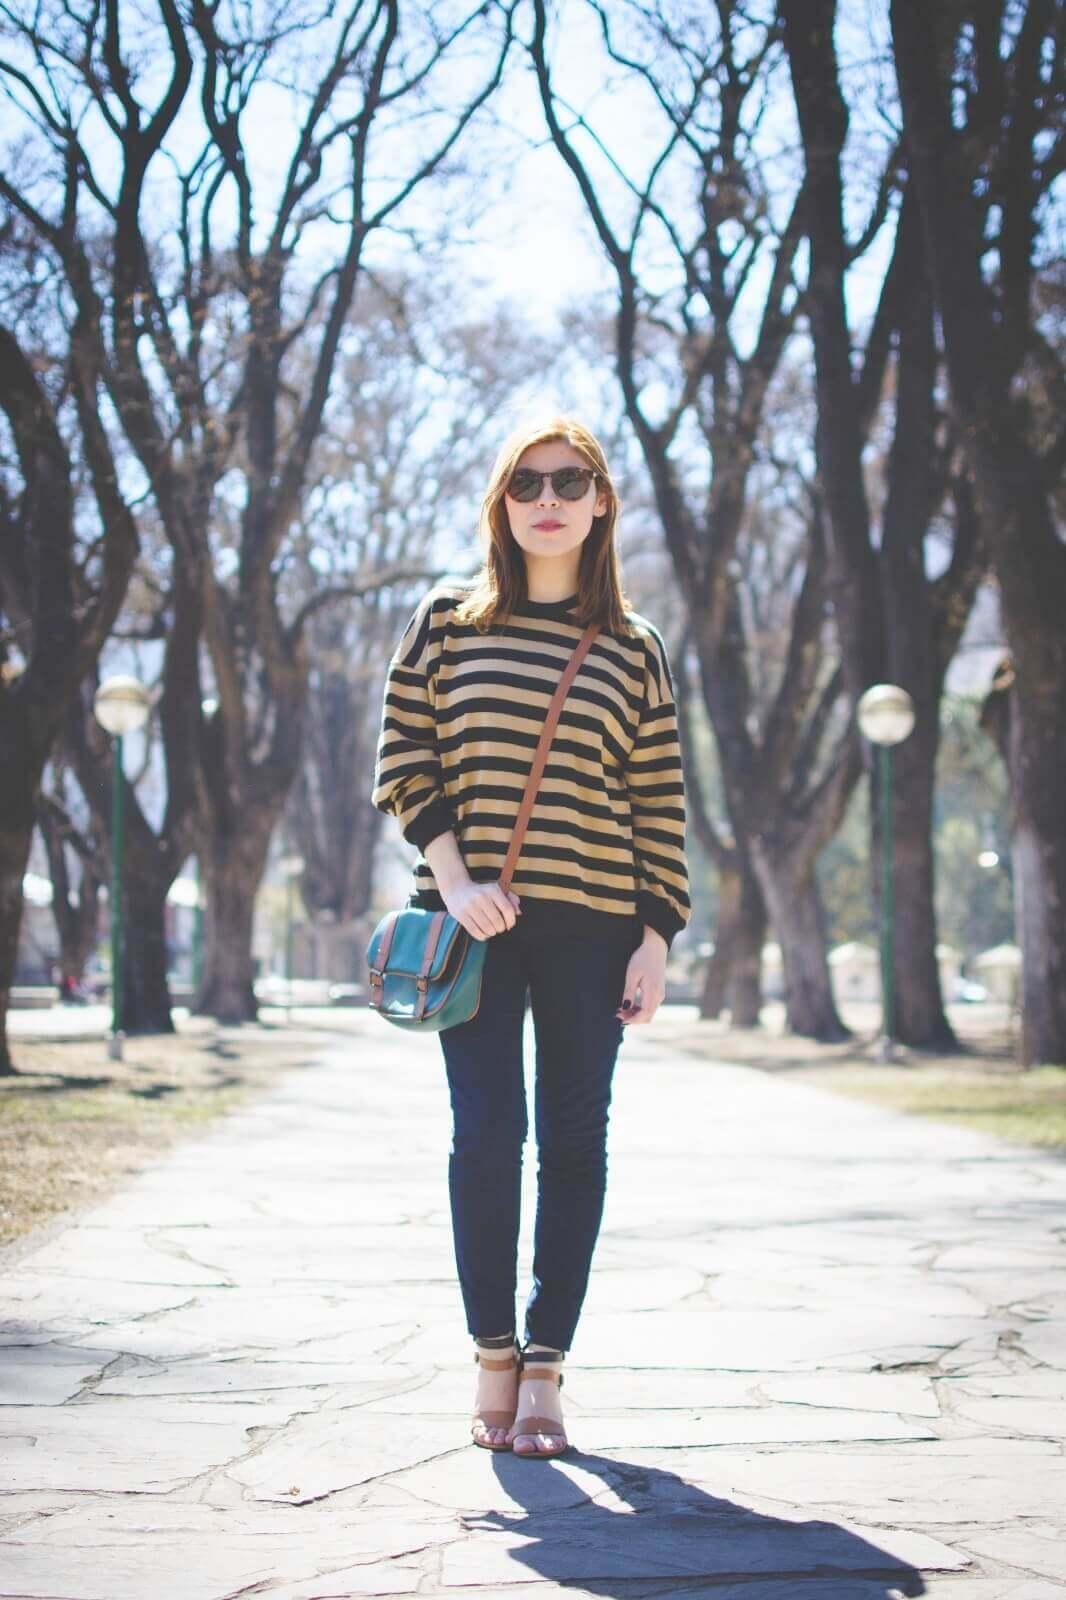 sammydress-block-heel-sandals-leopard-frame-light-brown-sammydress-sunglasses-deborah-ferrero-style-by-deb-streetstyle-salta-striped-sweater-fall2016-trends14